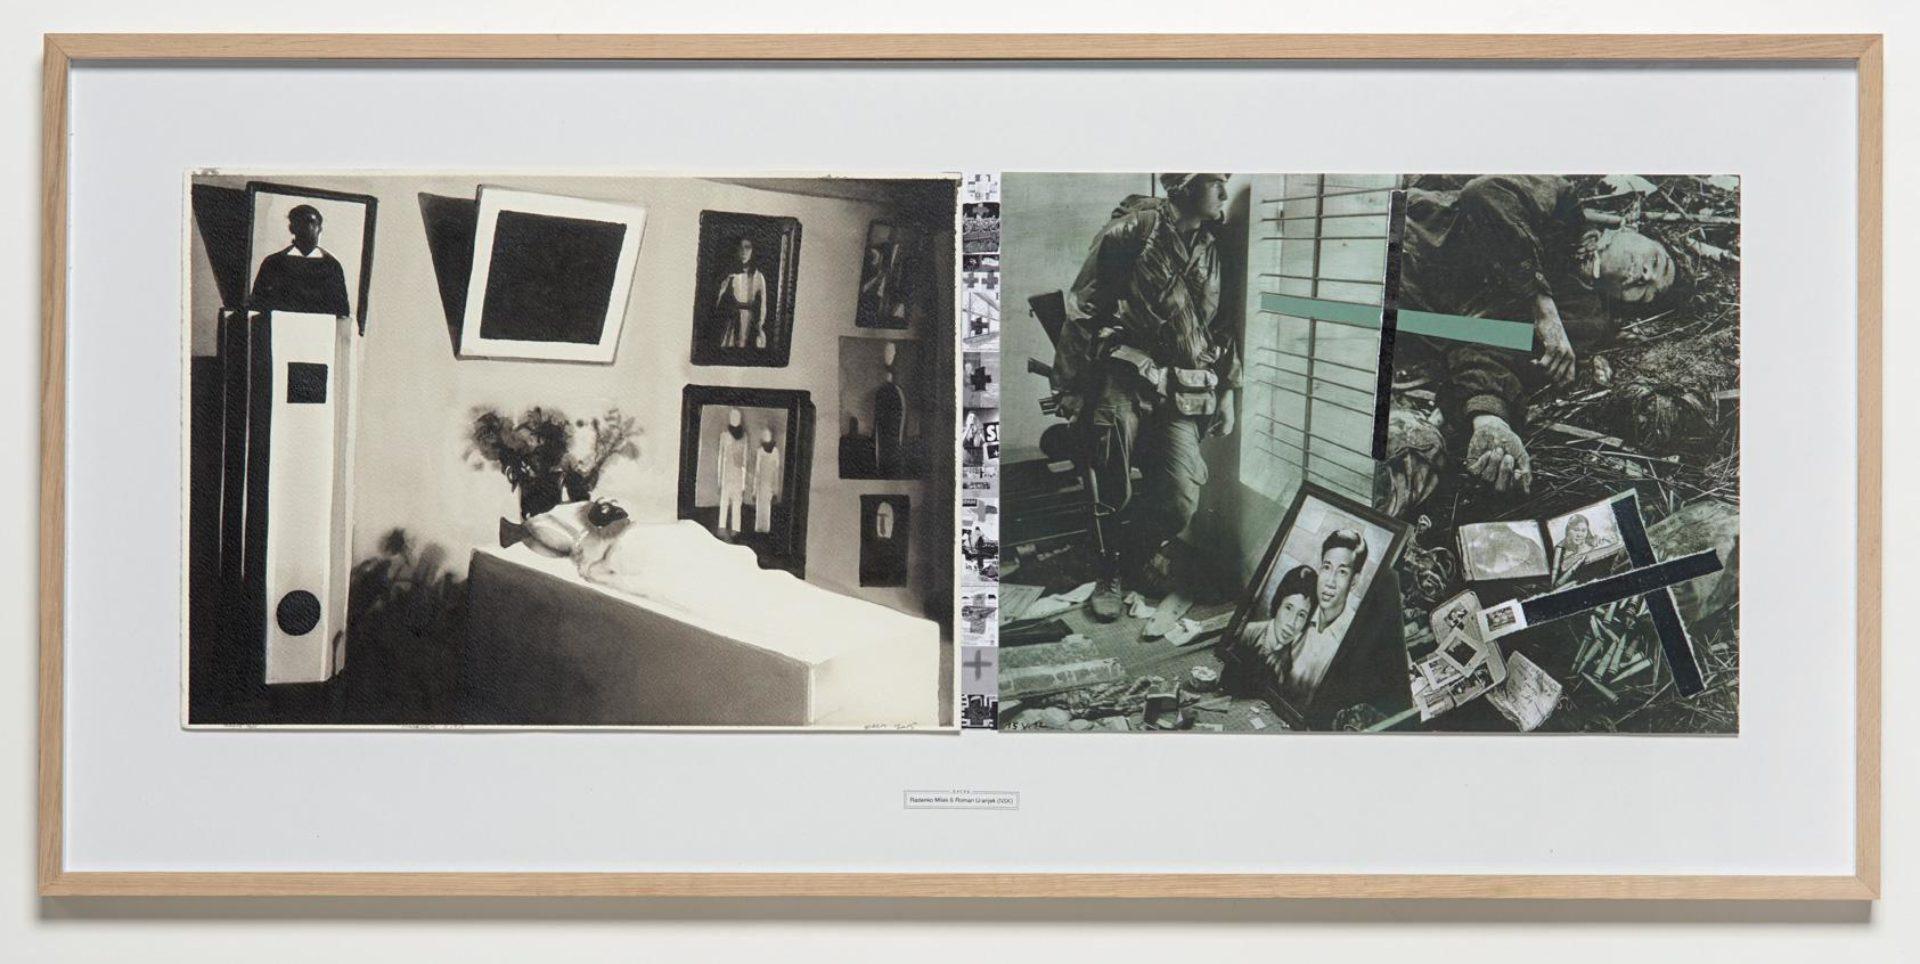 Radenko Milak, Roman Uranjek, Dates: May 15 1935, Malevich died, 2015